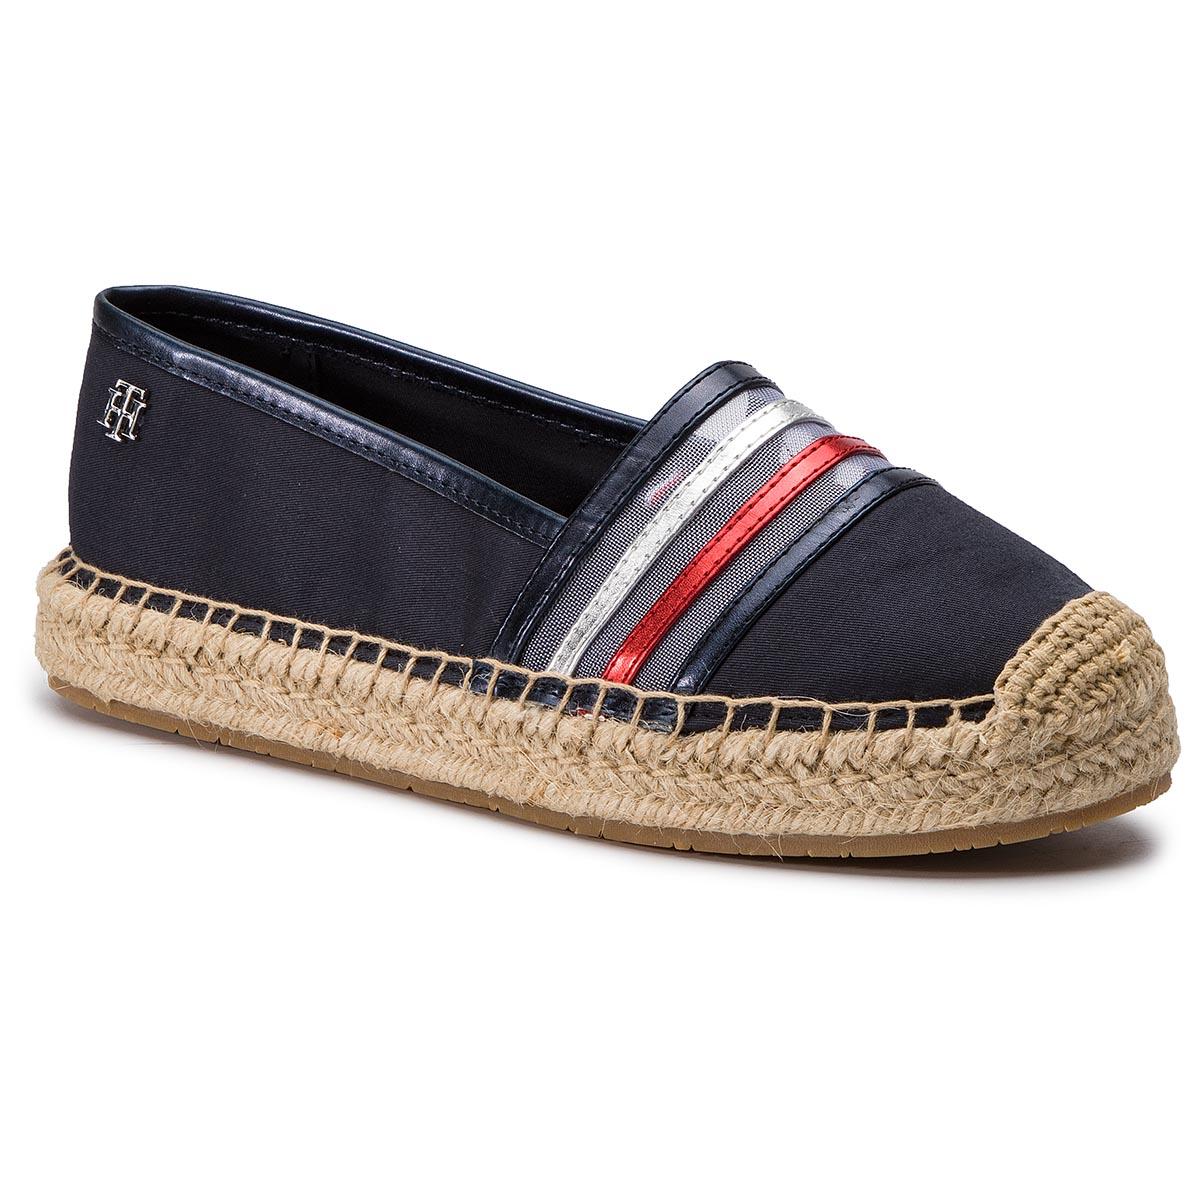 Sneakers Plus Grand 7 2 119 37cfa0054208 Pnkwht Ziane Cfa Lacoste 2IWDE9H